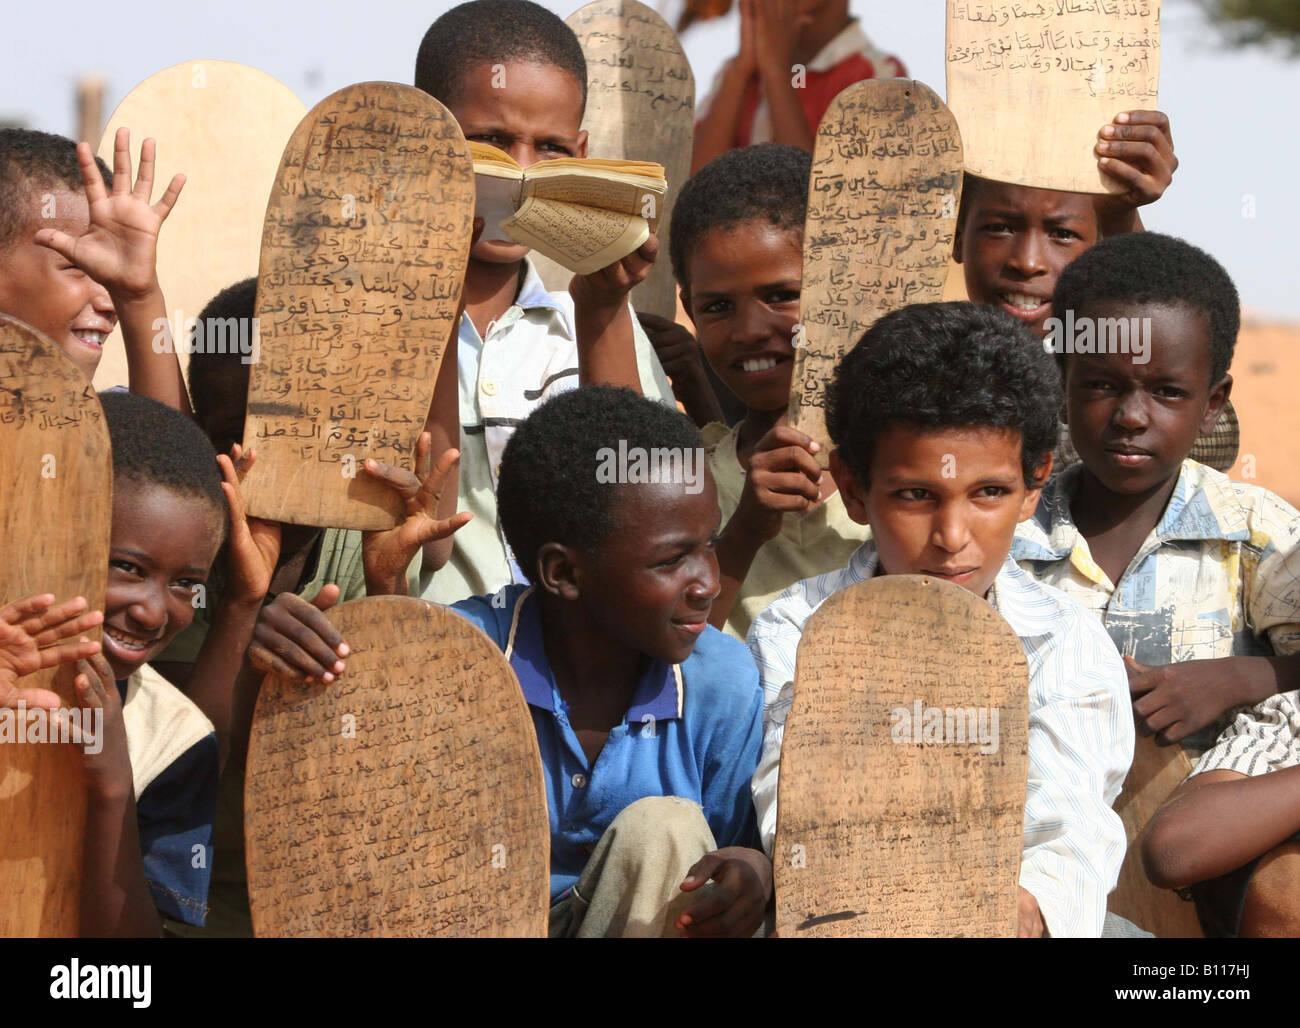 Mauritania / Education - LookLex Encyclopaedia